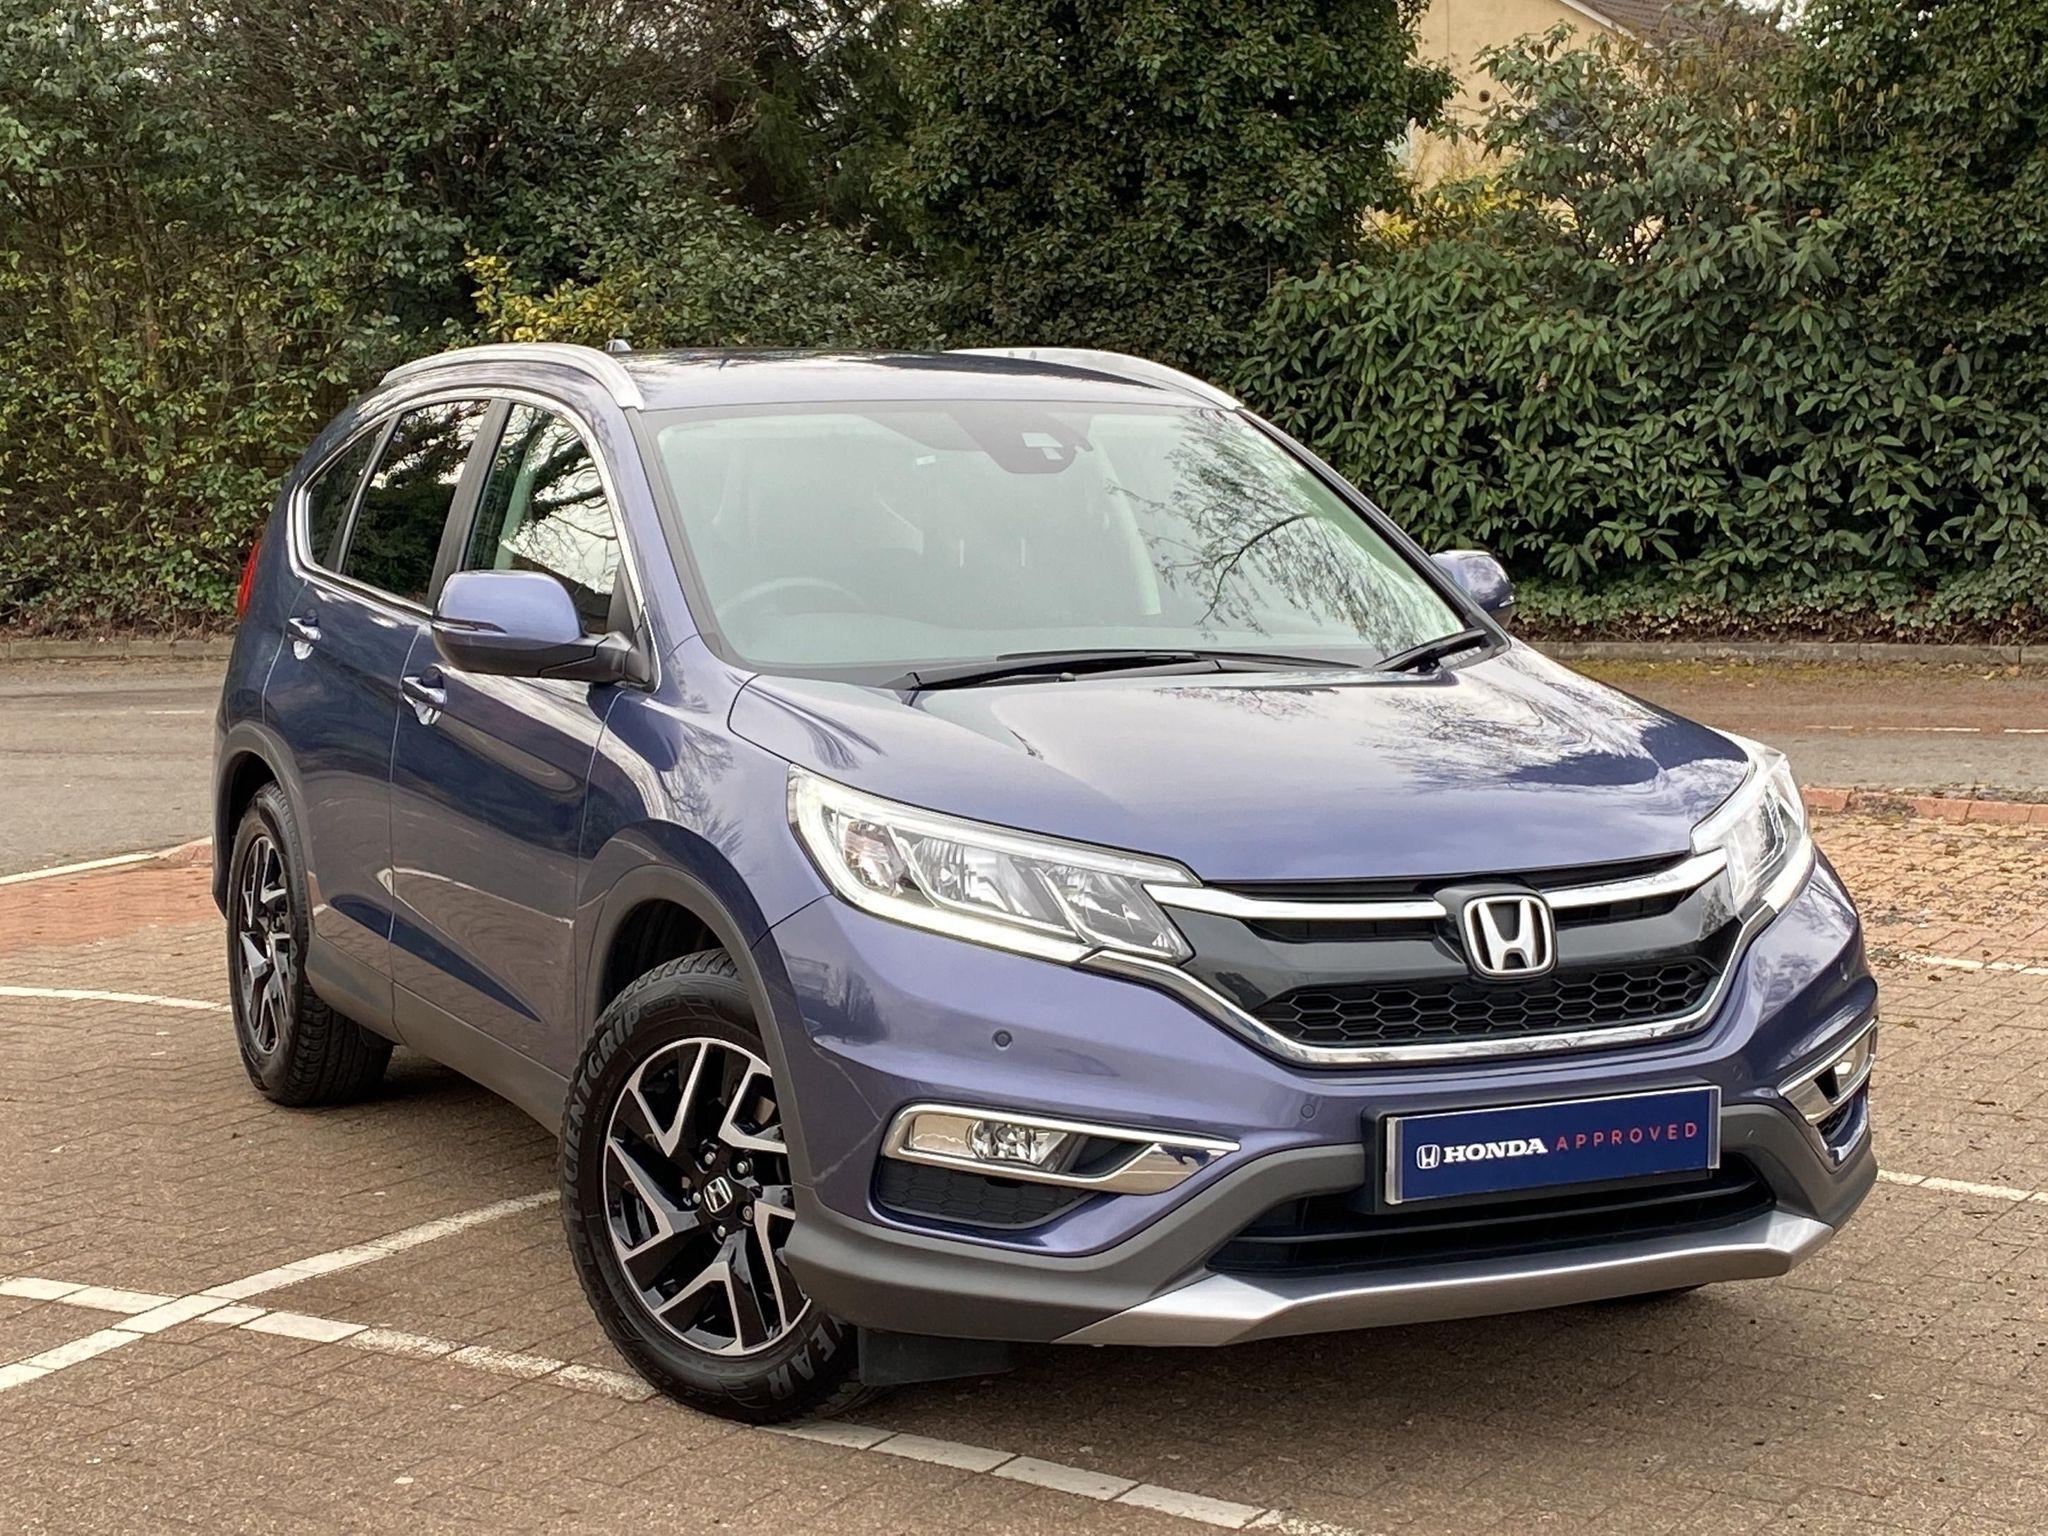 Honda CR-V 1.6 i-DTEC SE Plus Navi (s/s) 5dr